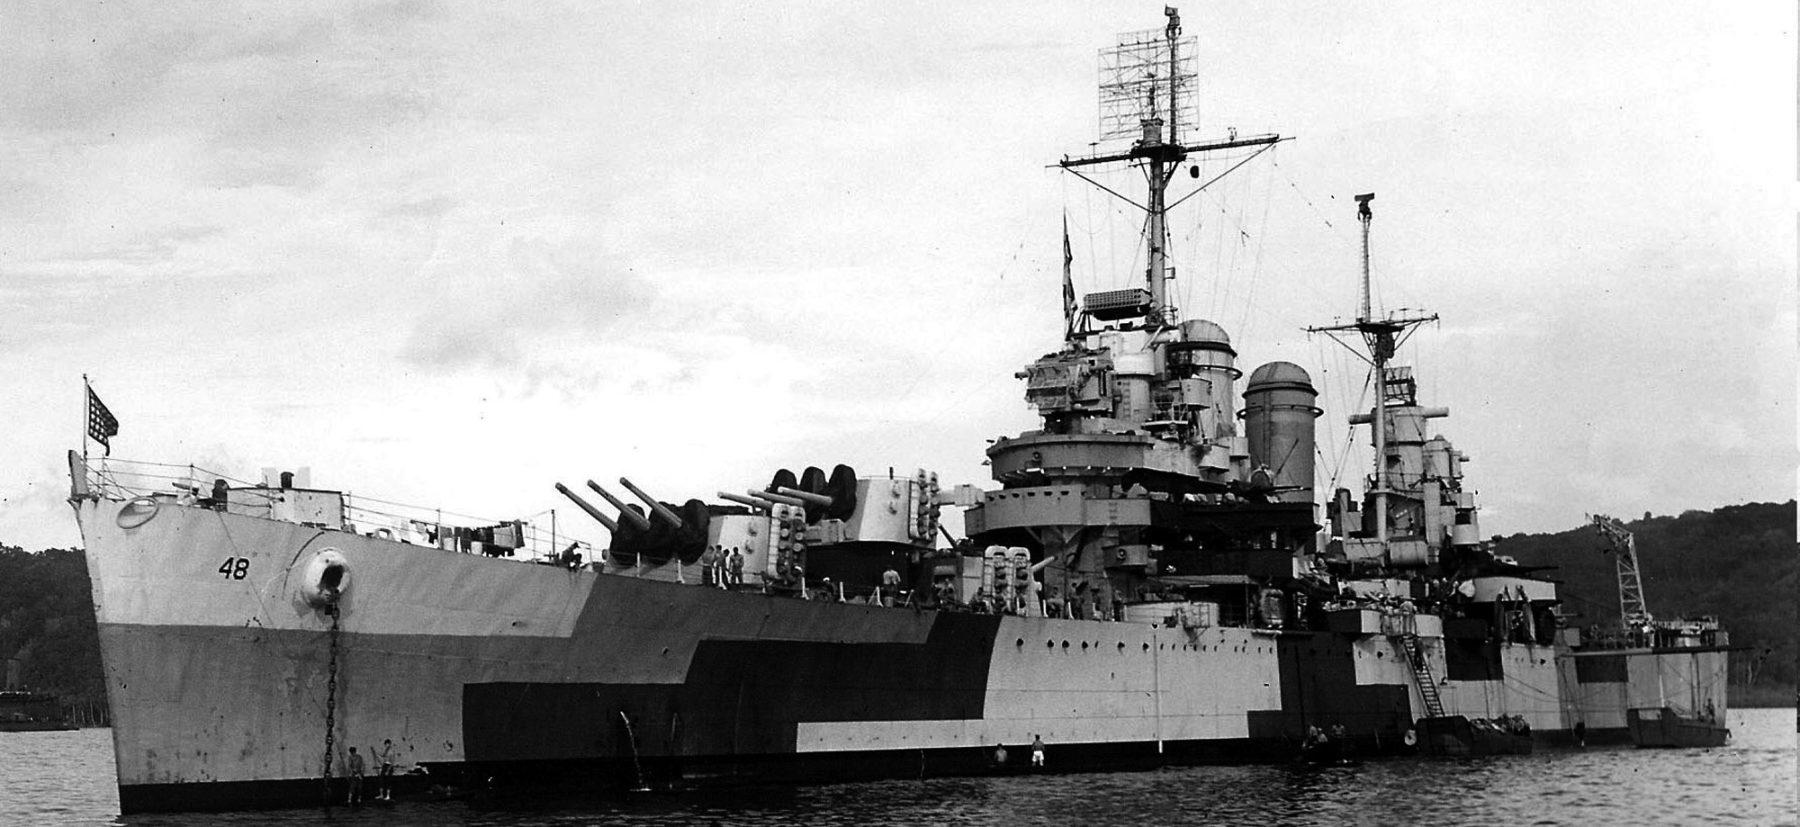 Brooklyn class cruisers